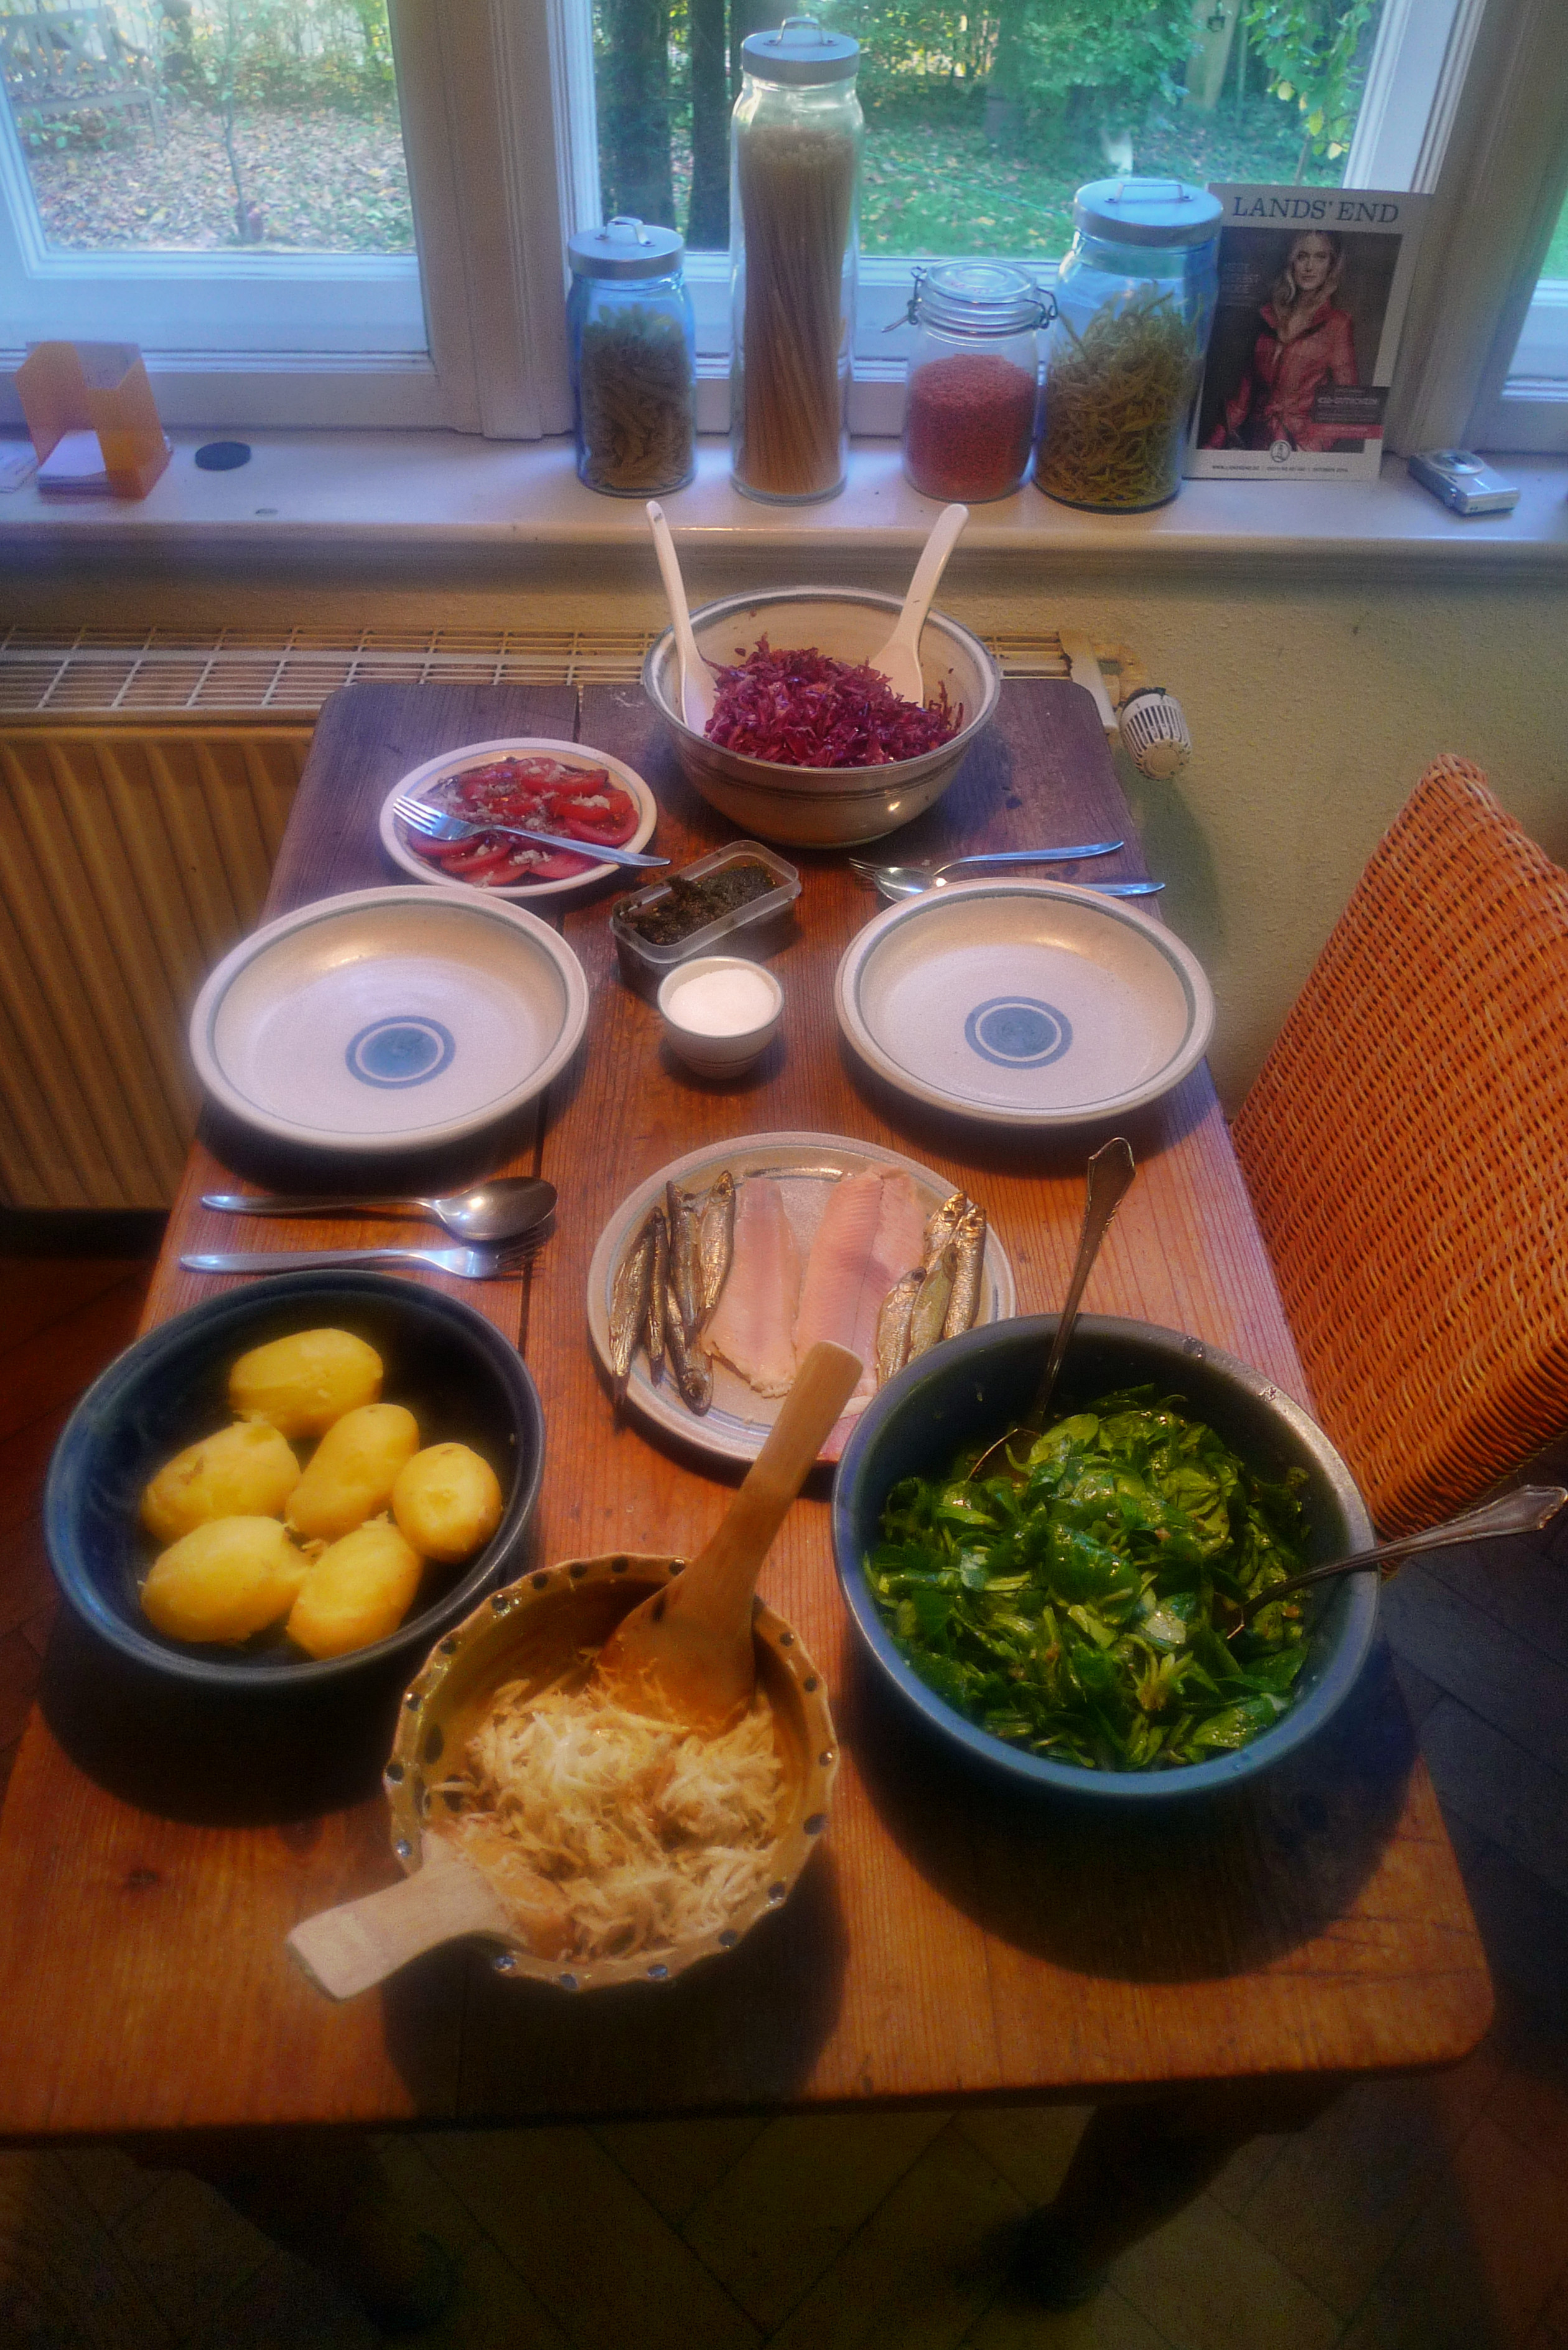 Foewllw-Salate-Kartoffeln-24.10-14   (7)